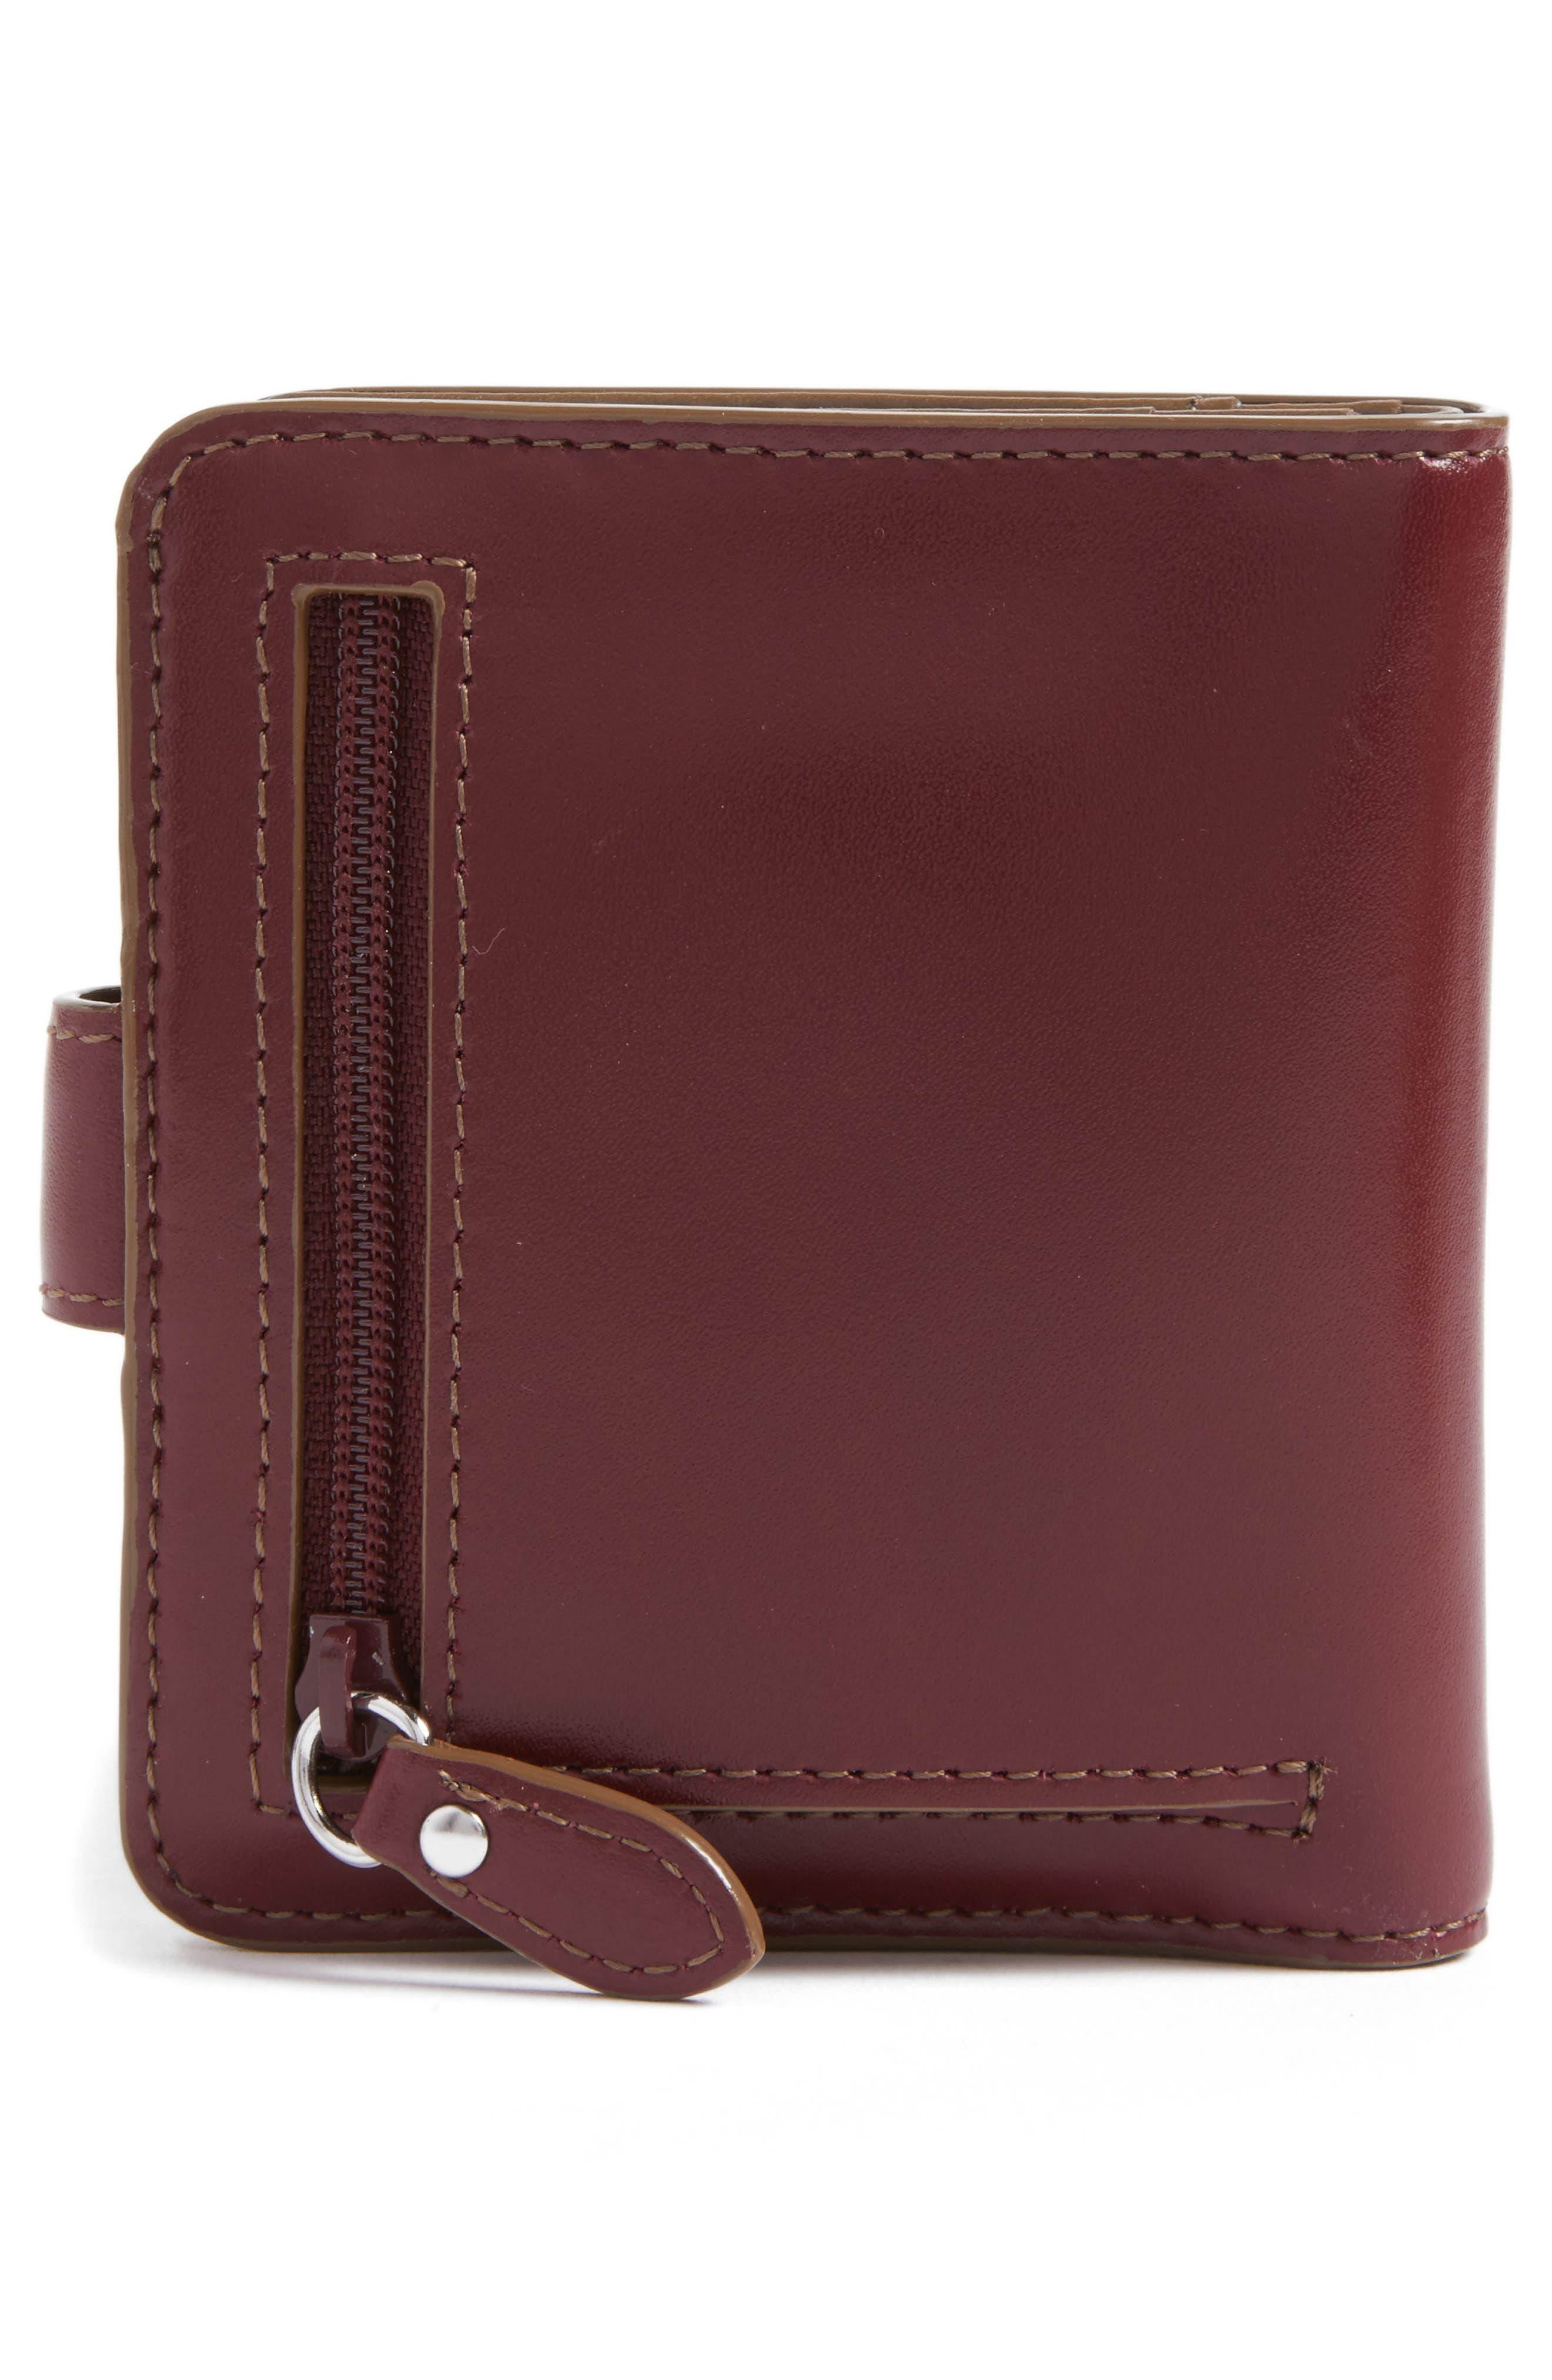 Lodis Petite Audrey RFID Leather Wallet,                             Alternate thumbnail 12, color,